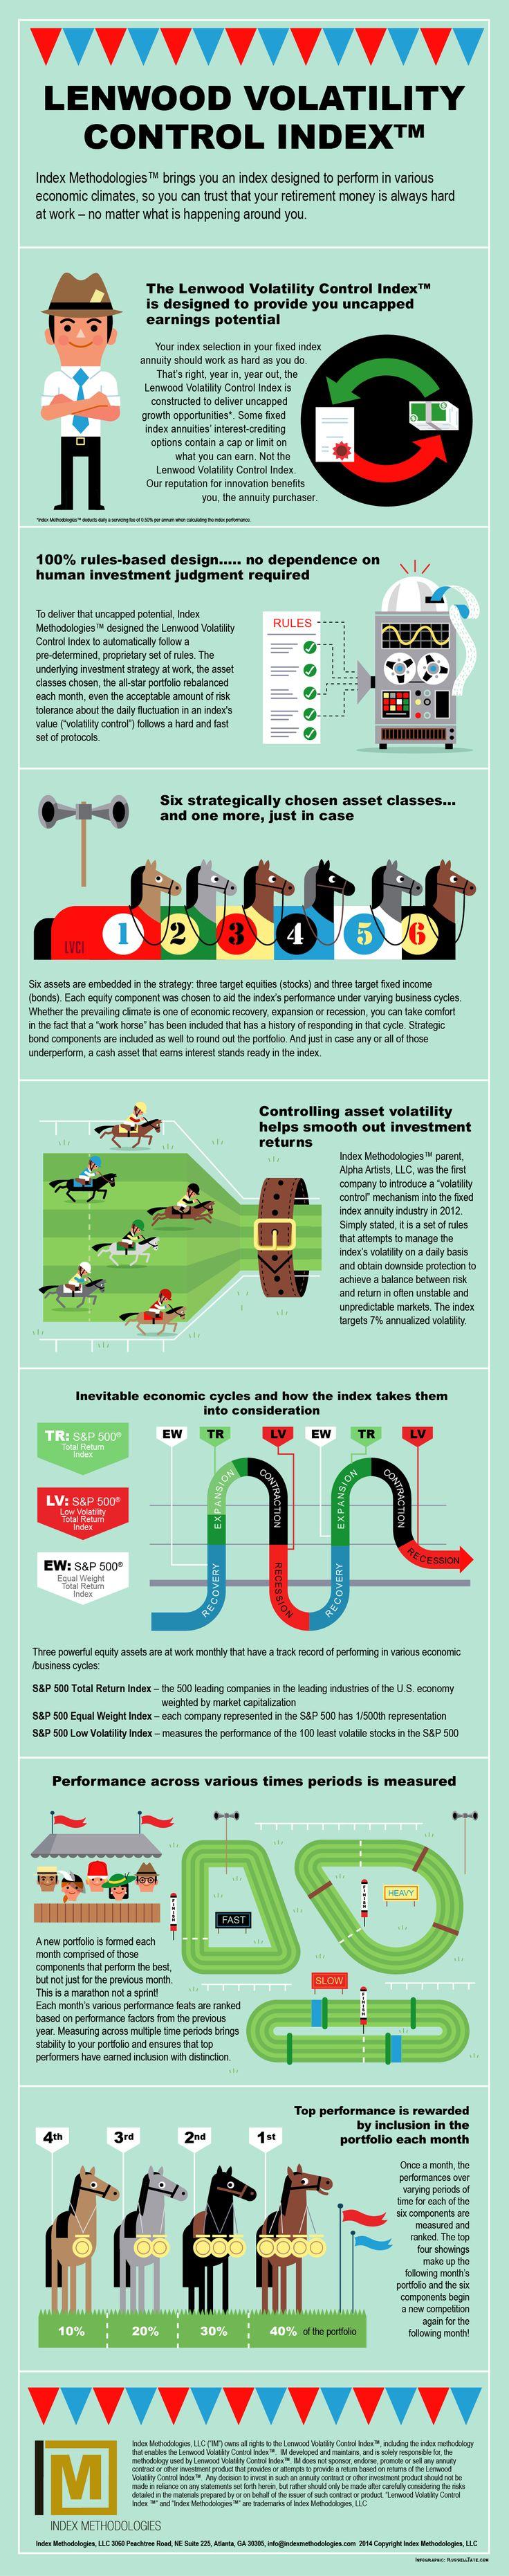 Finance Infographic.  Design: Russell Tate. www.RussellTate.com